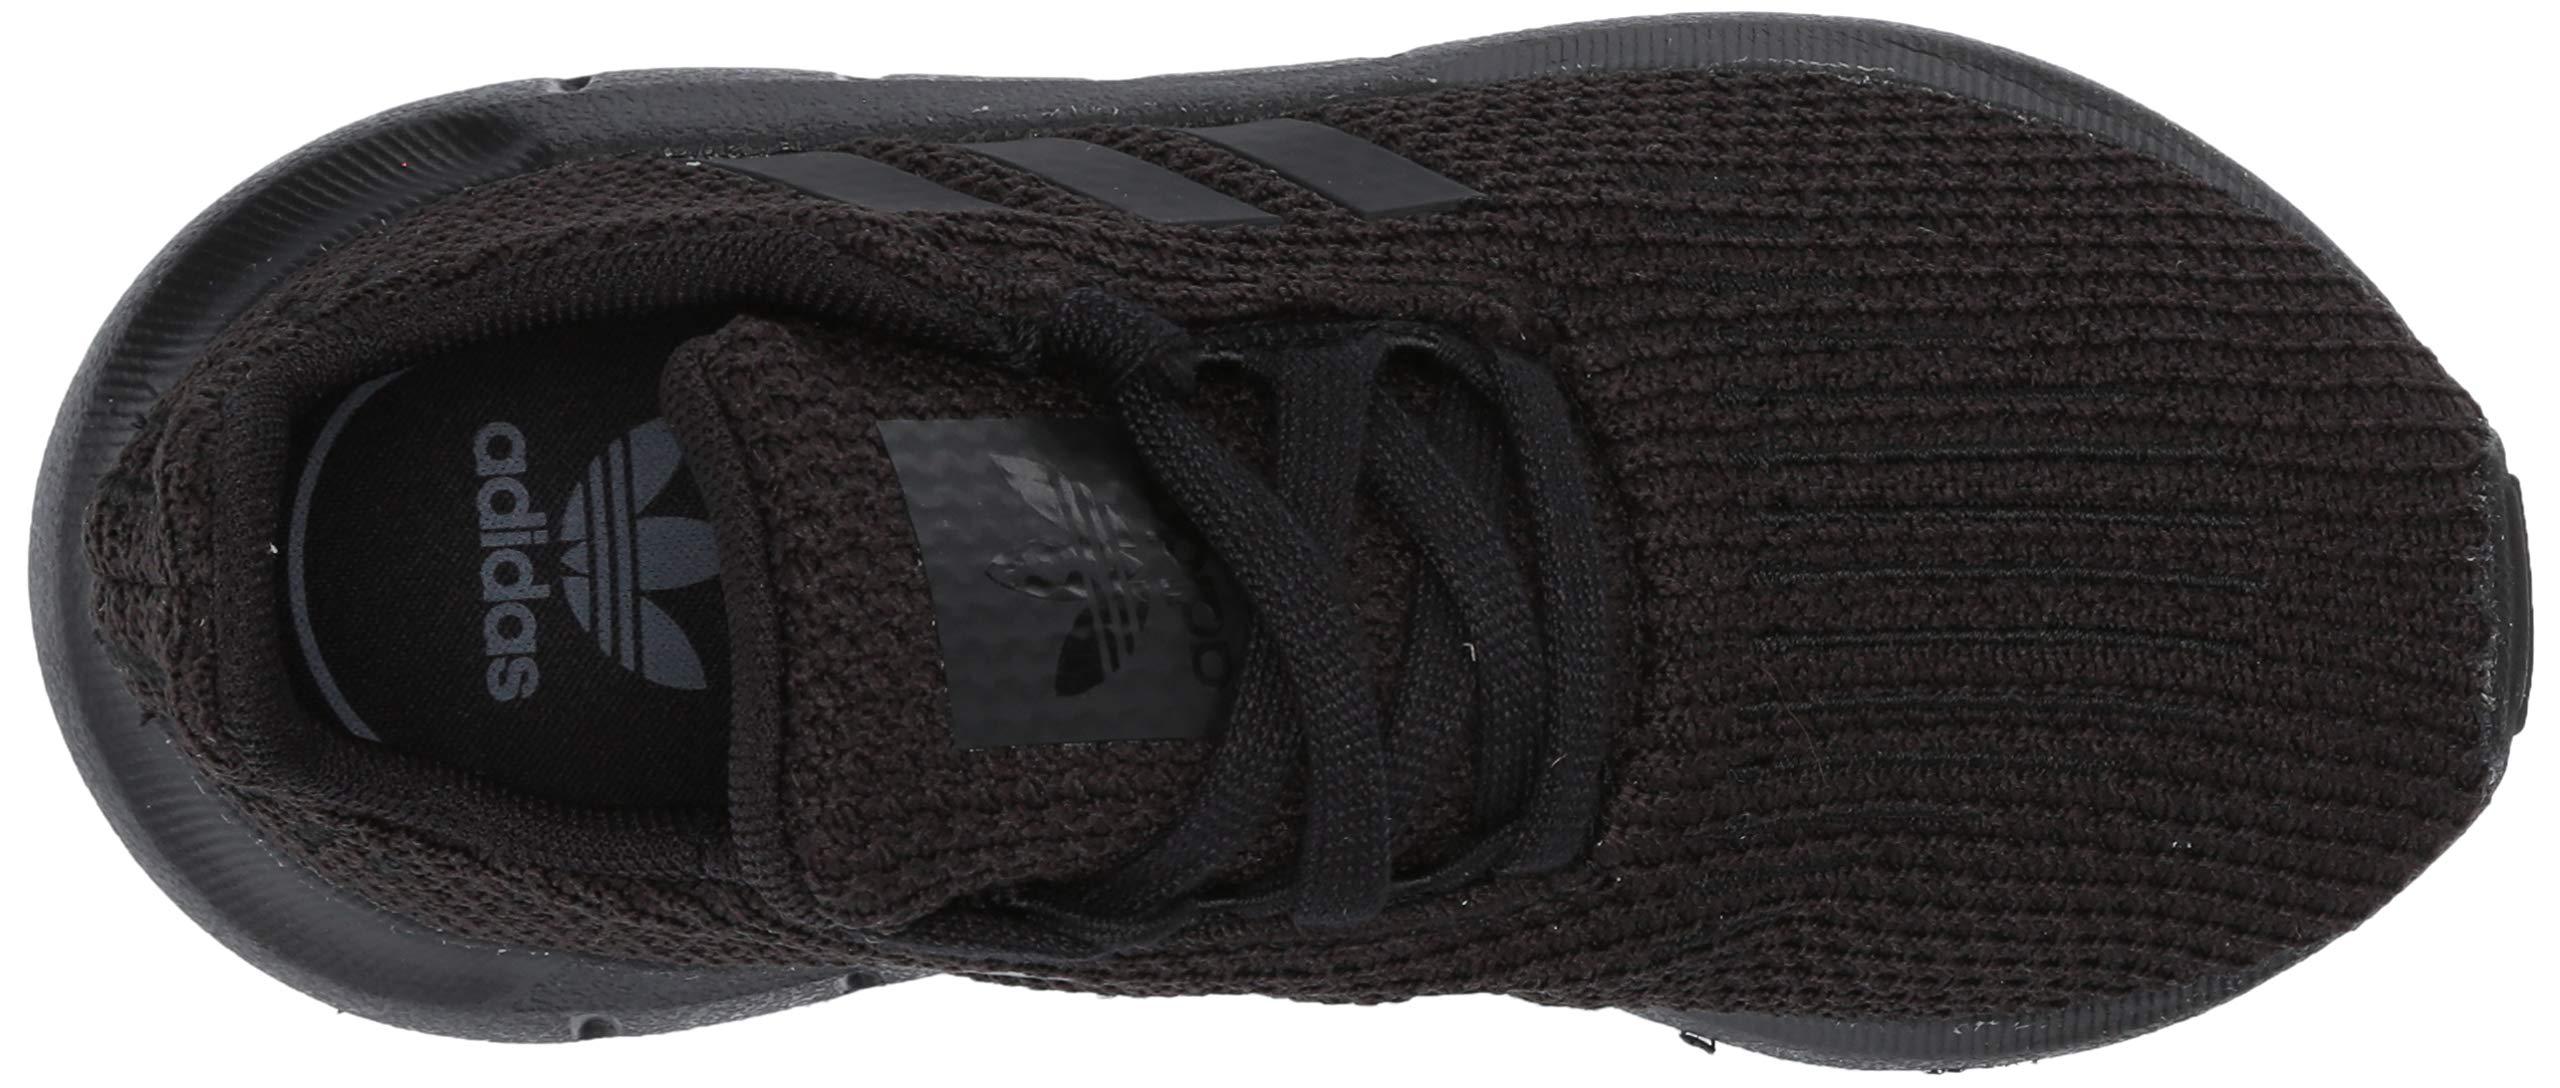 adidas Originals Baby Swift Running Shoe, Black, 5K M US Toddler by adidas Originals (Image #10)